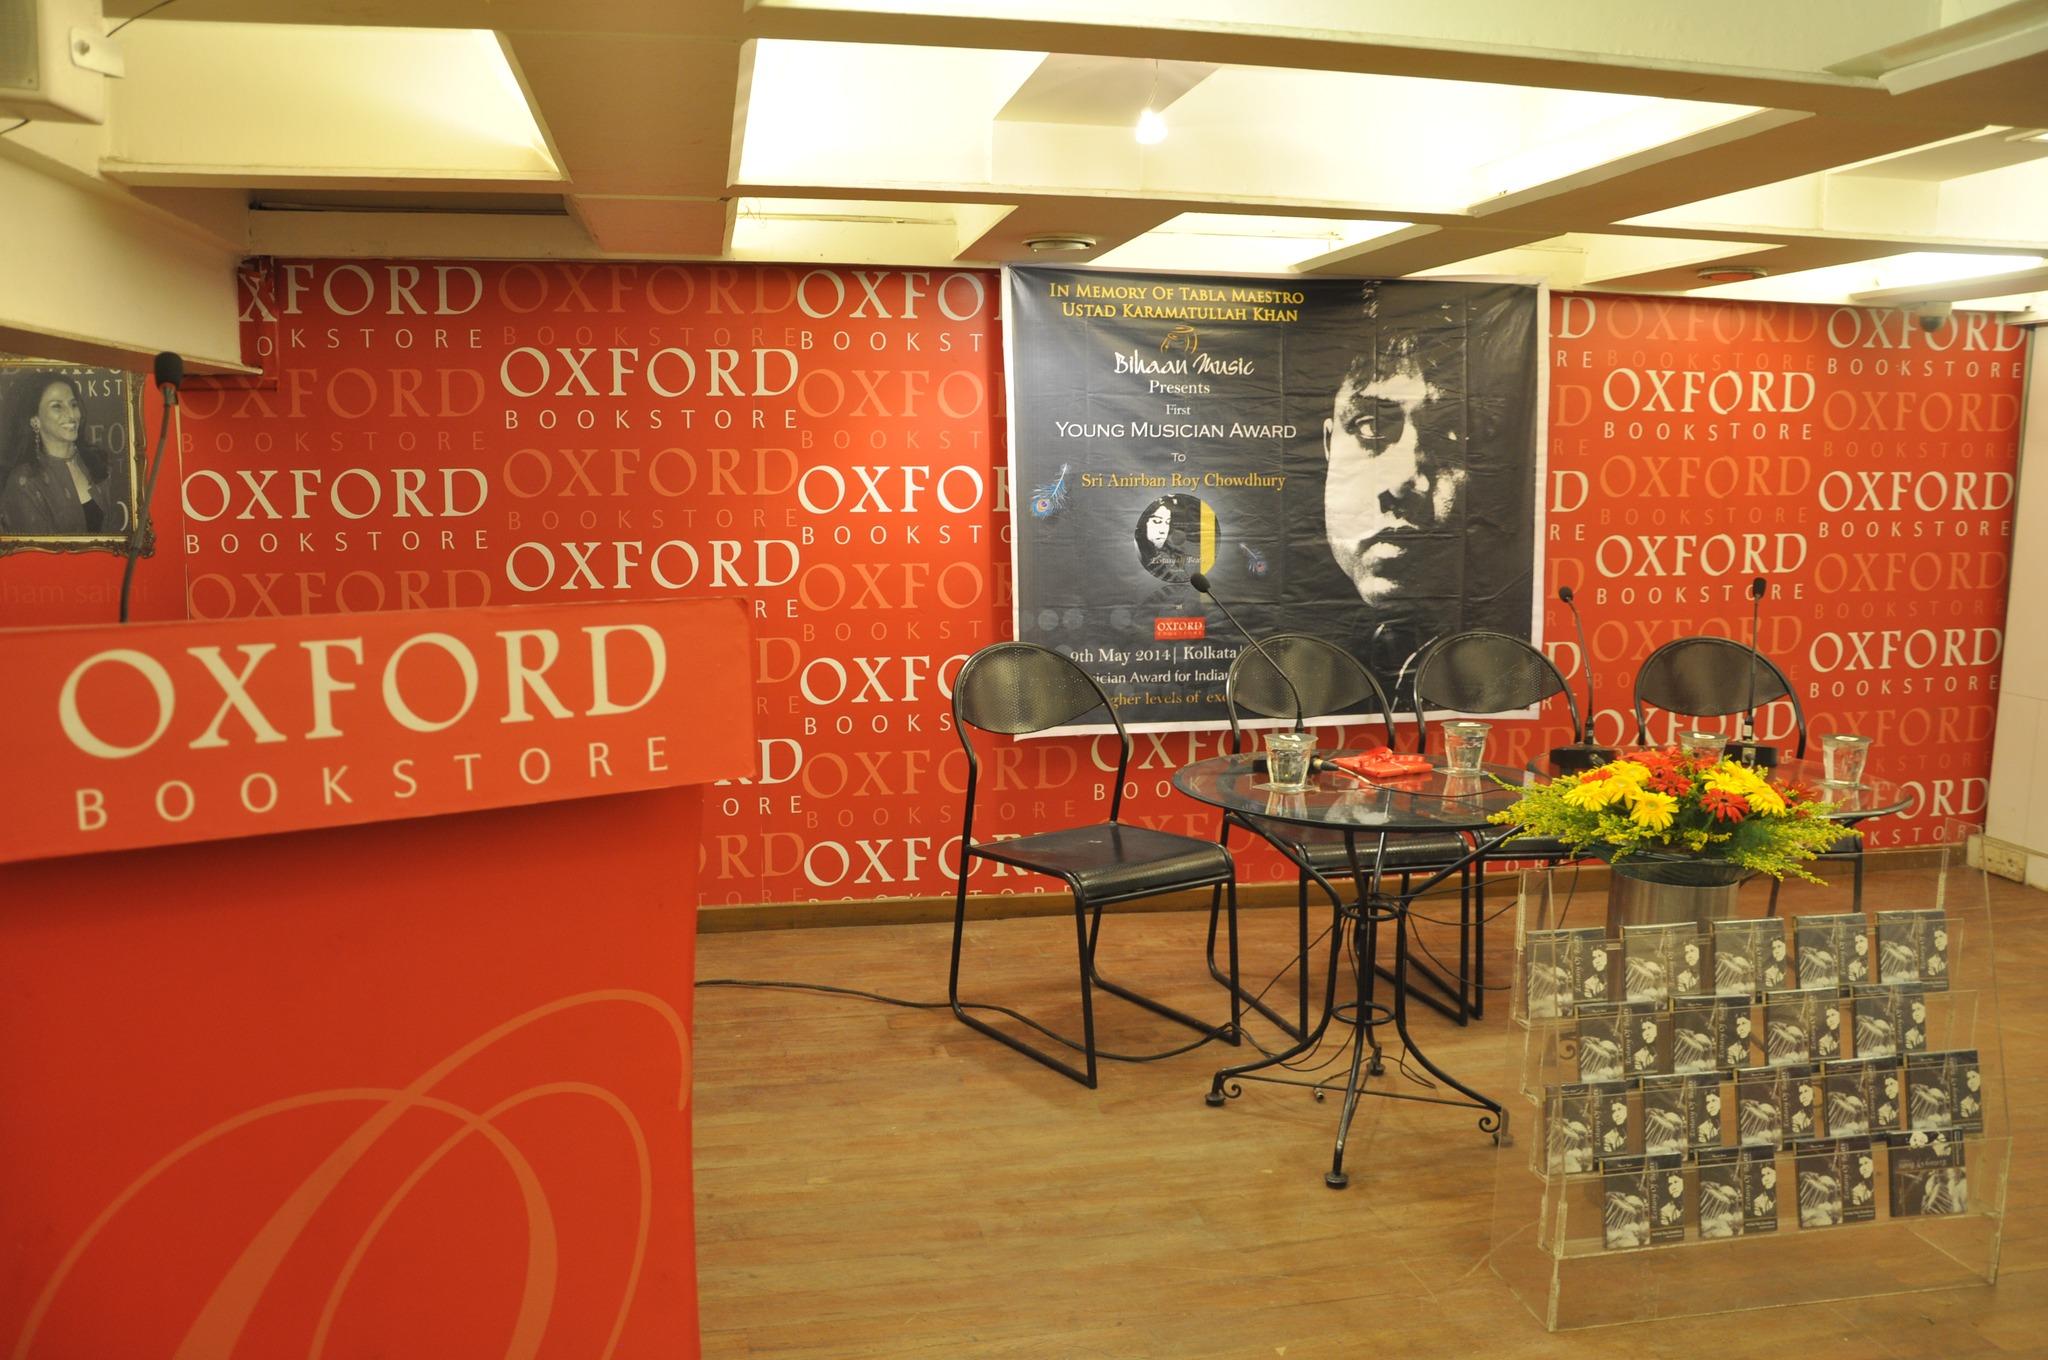 Award_CD release_Oxford Bookstore